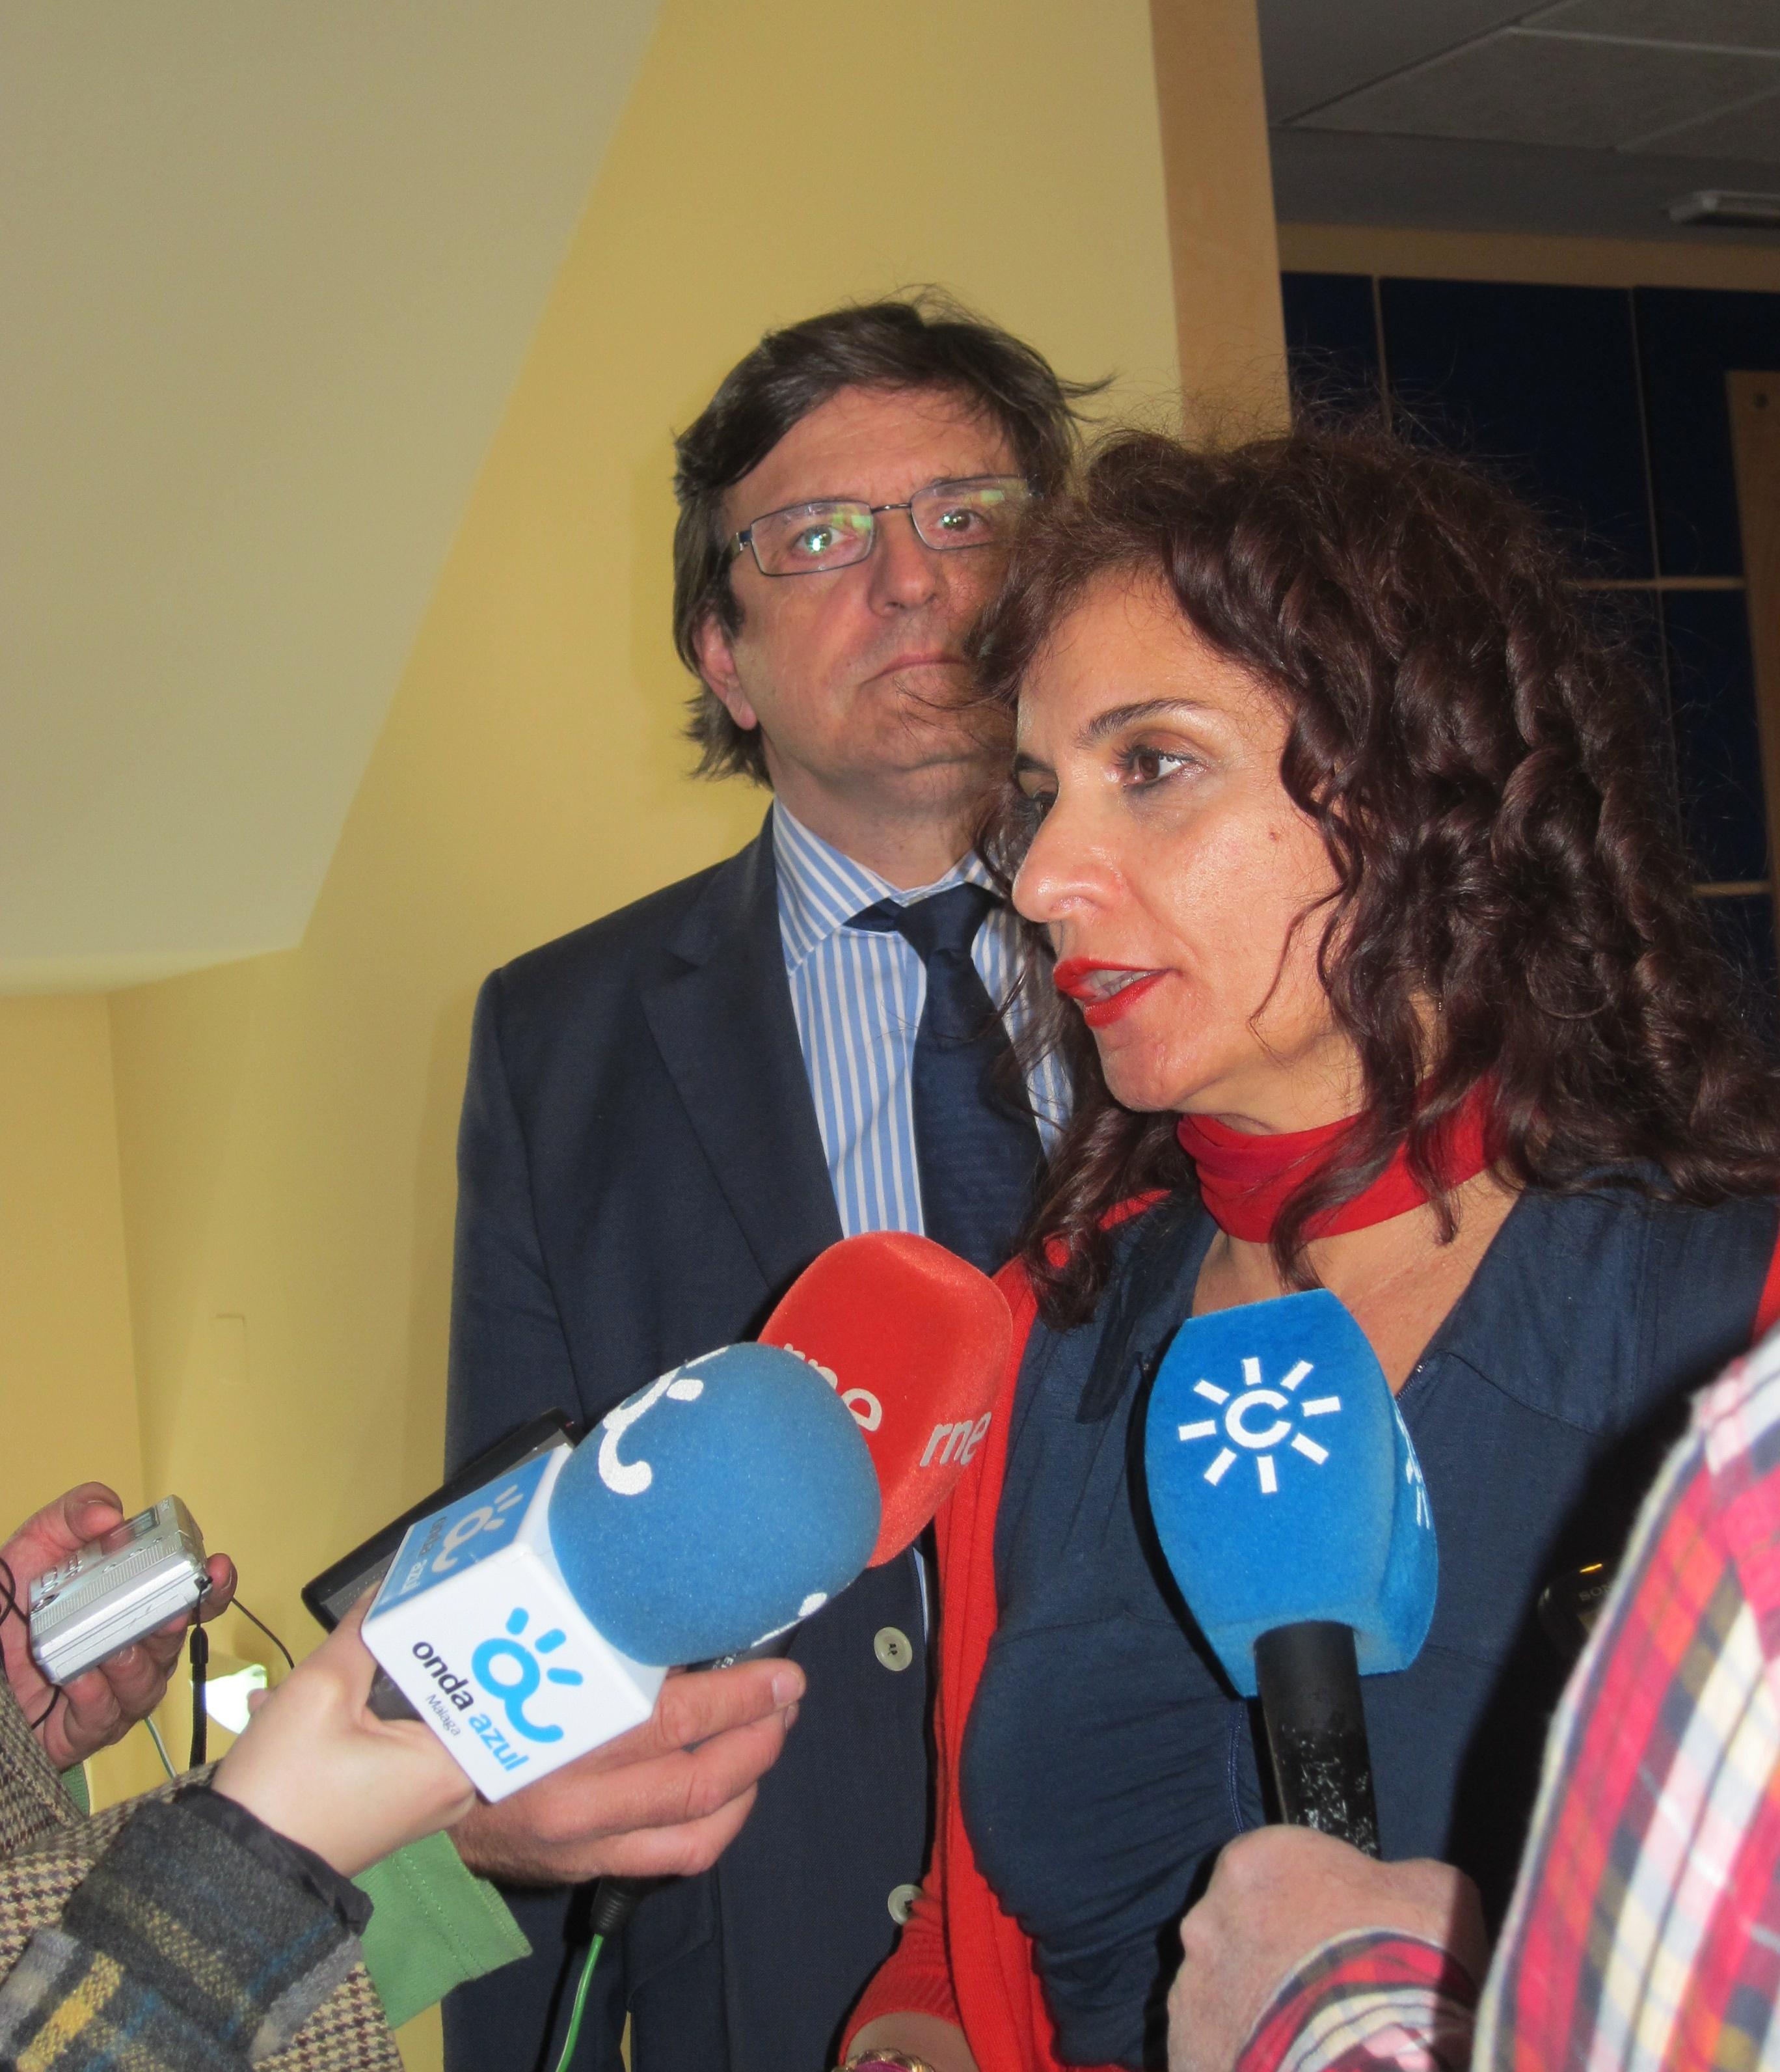 Montero asegura que el plan de garantía alimentaria se implantará de manera definitiva «a partir de octubre o noviembre»